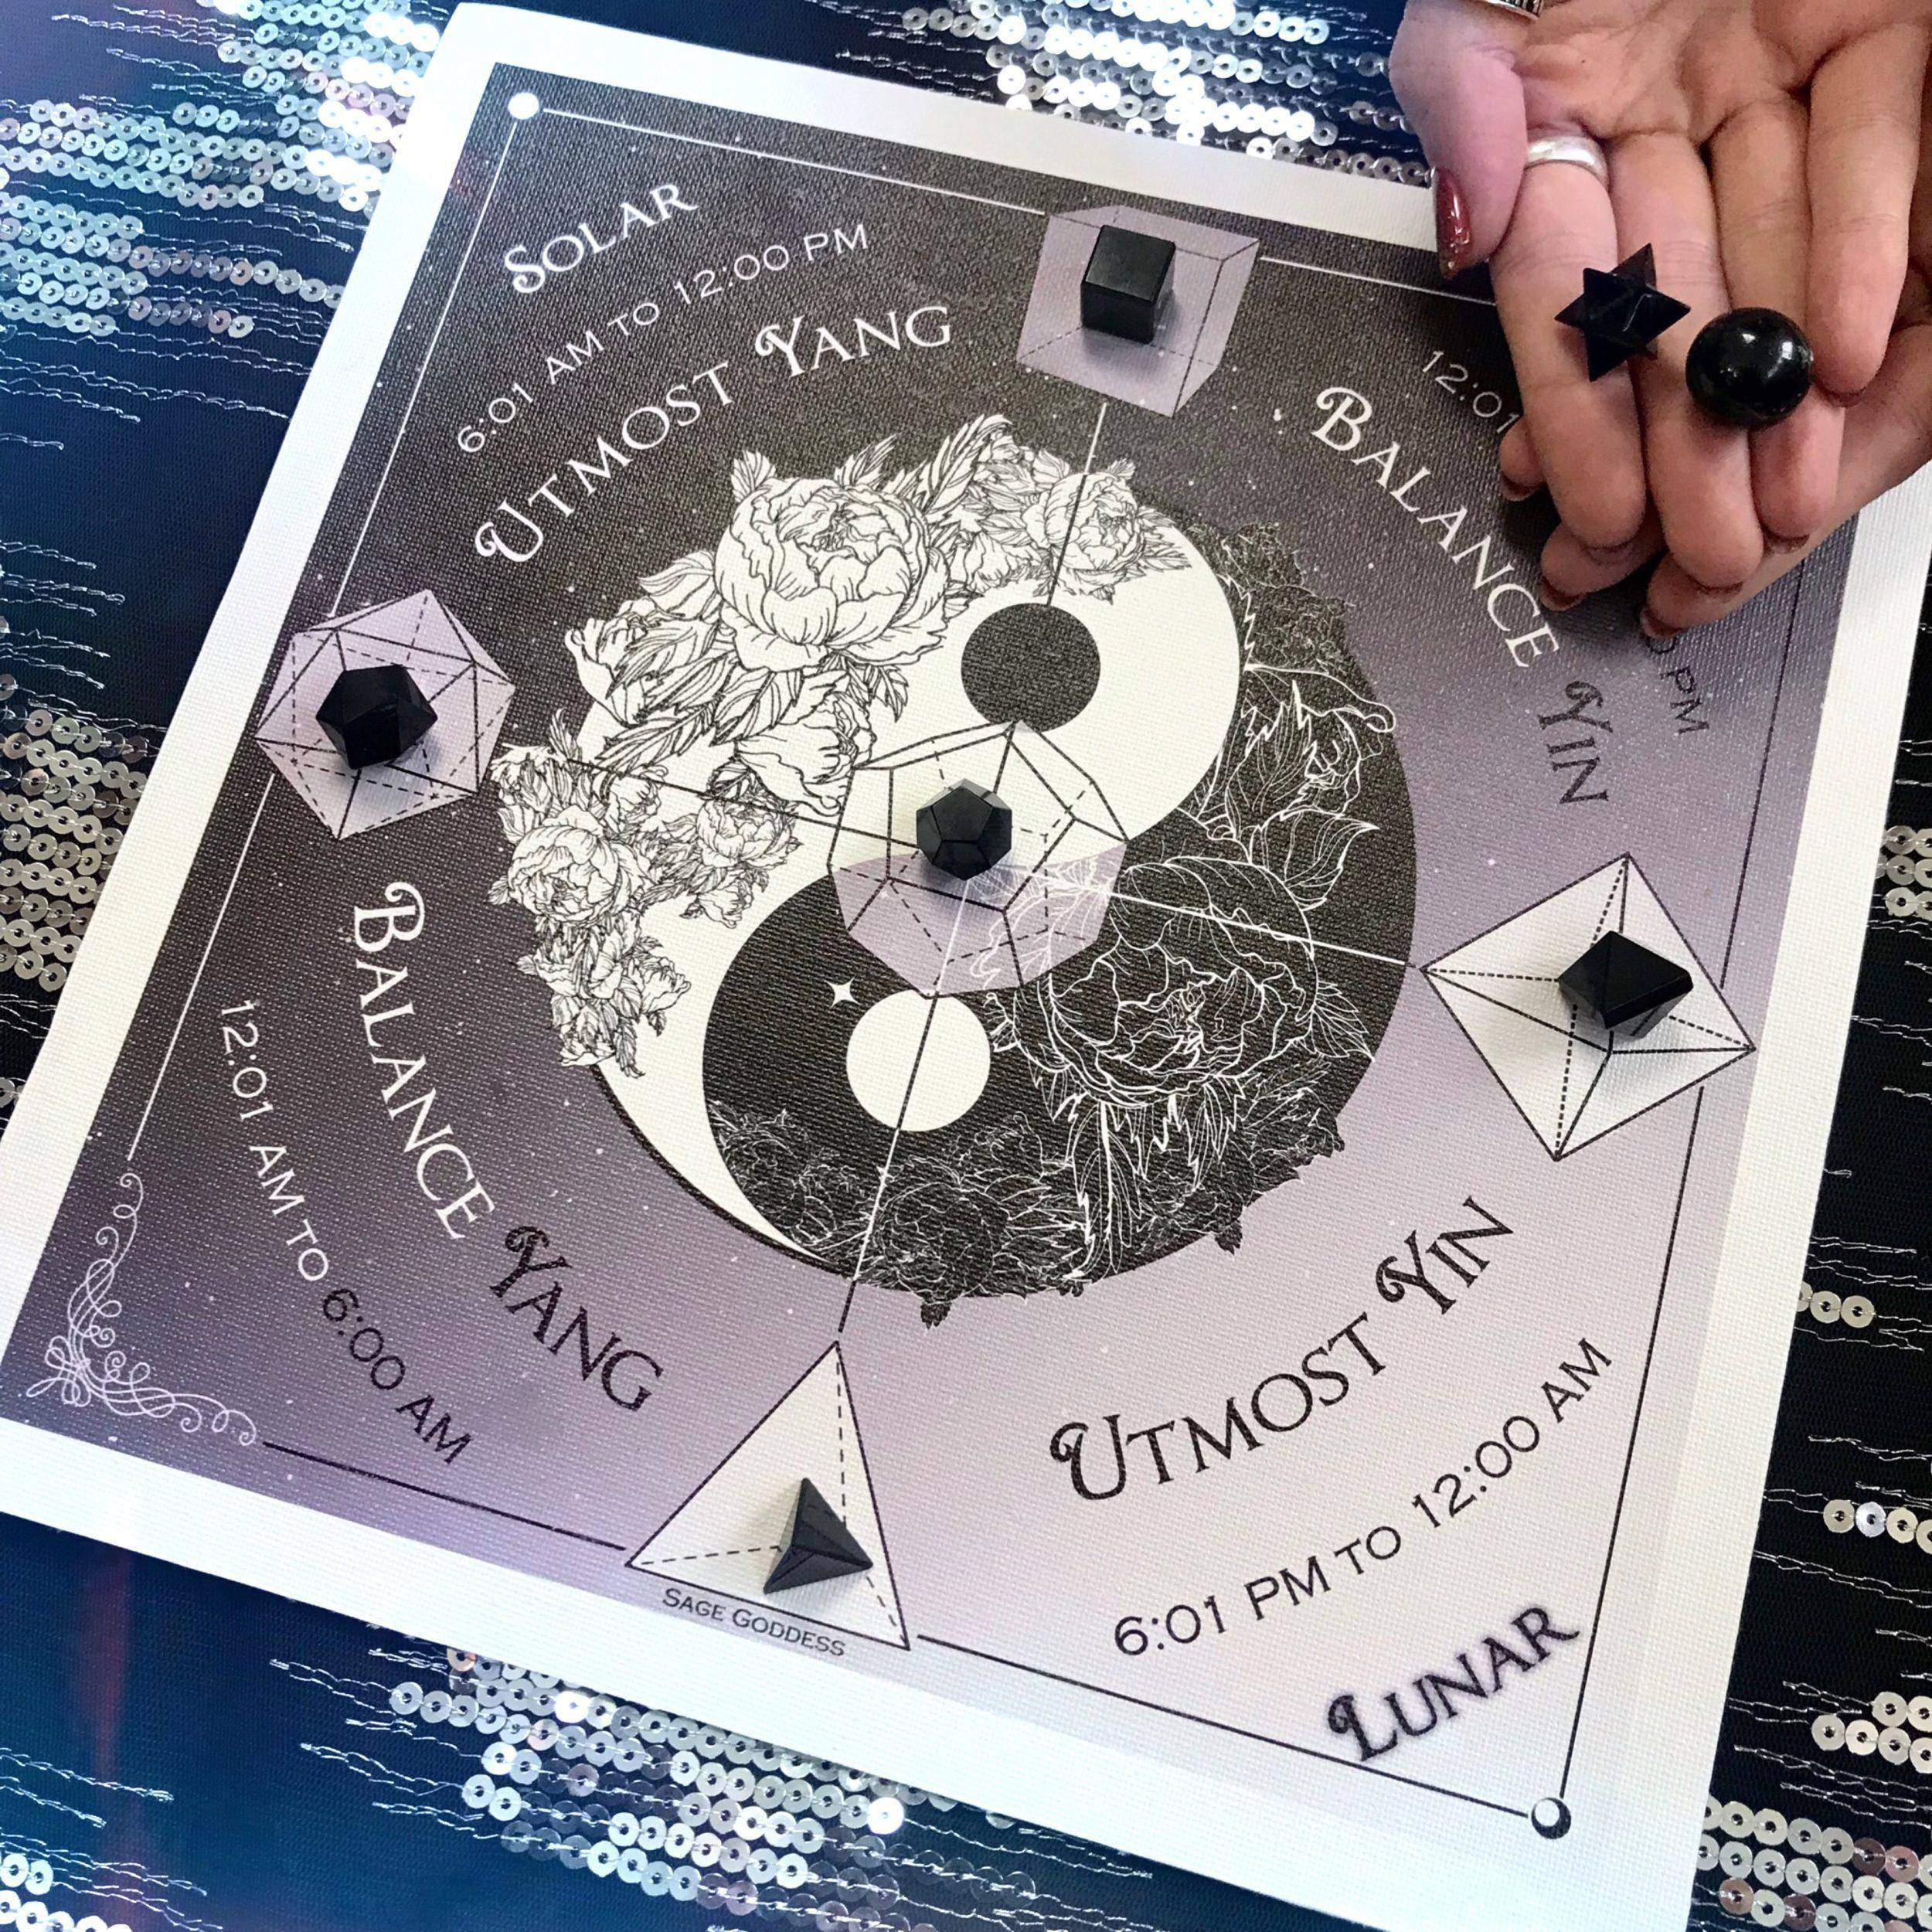 OLAS_Yin_Yang_Birth_Time_Set_bonus_class_3OF6_9_29